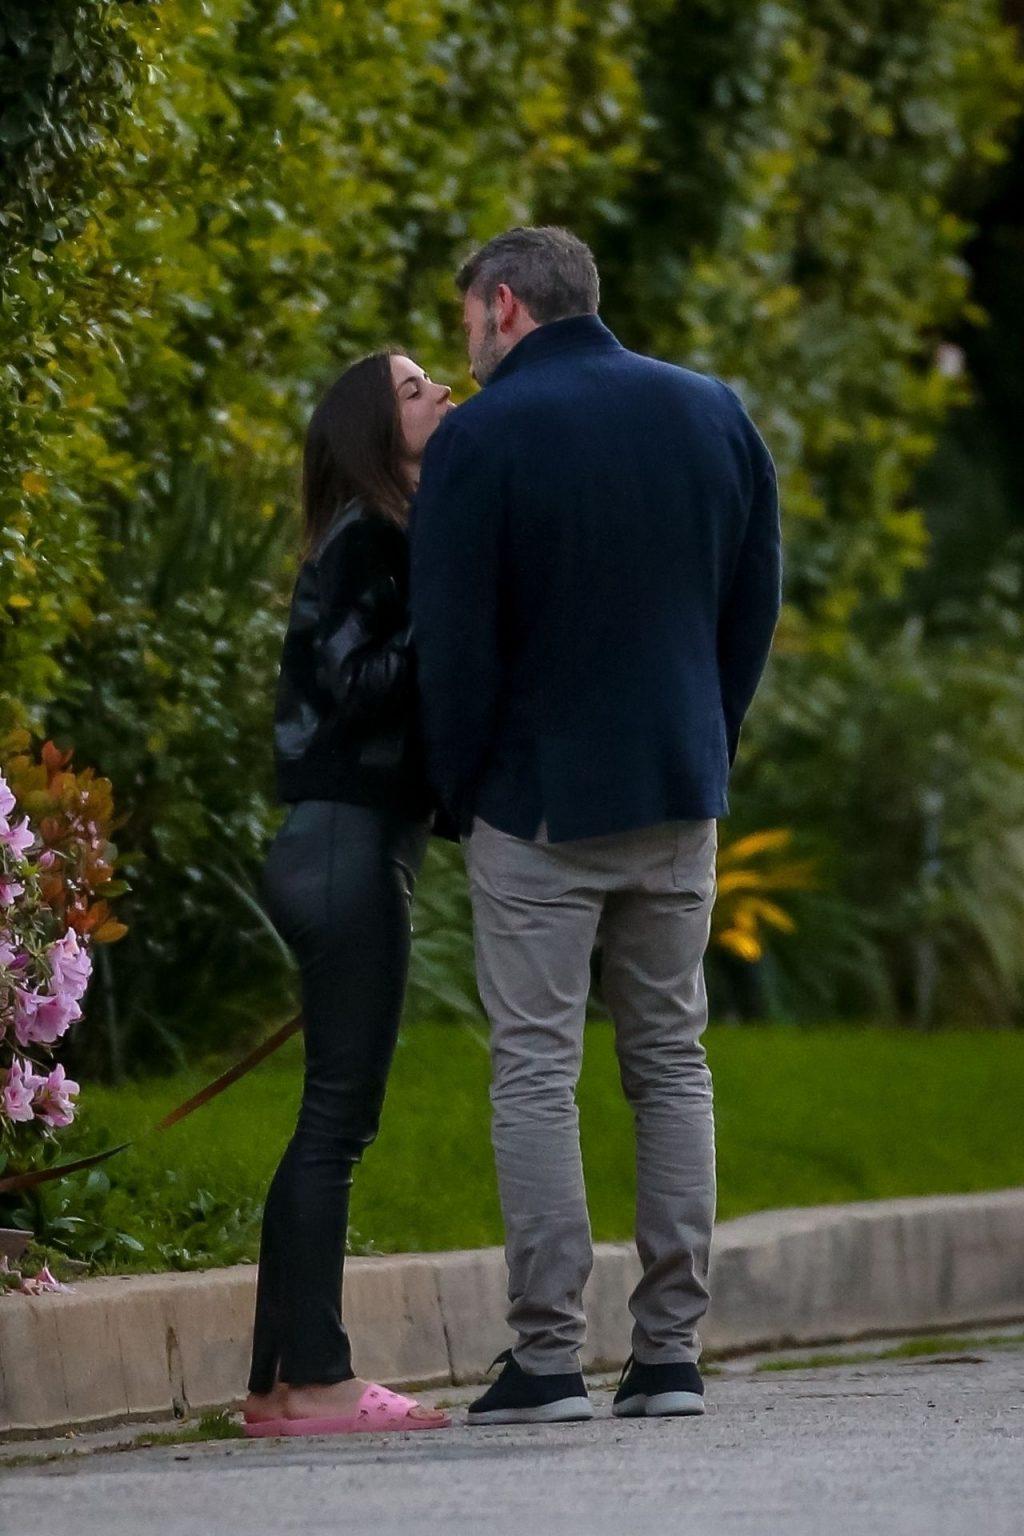 Ana de Armas Sexy The Fappening Blog 10 1 1024x1536 - Ben Affleck & Ana de Armas Can't Take Their Hands Off Each Other During Romantic Stroll (109 Photos)